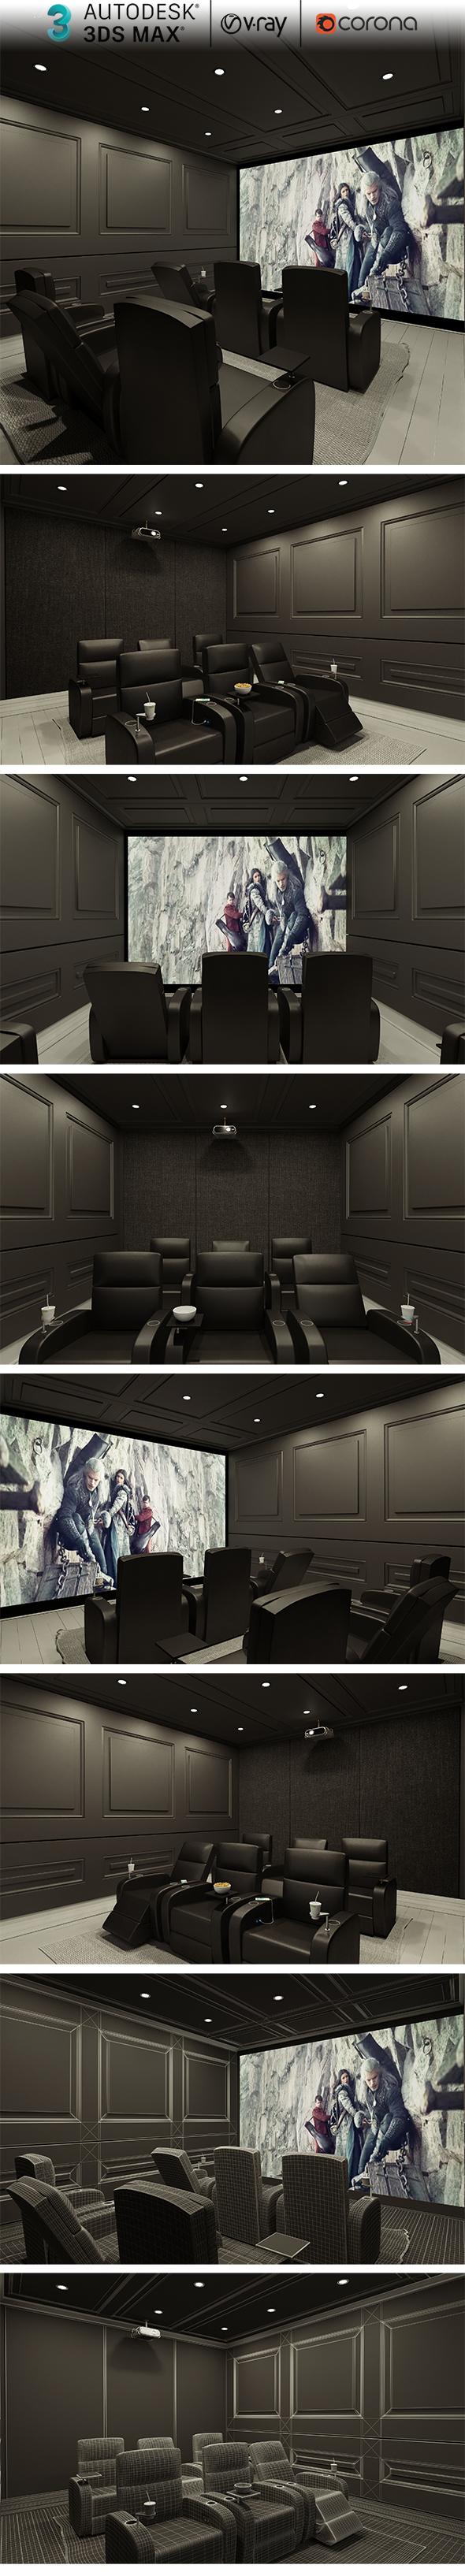 Home Cinema Design Collection 19